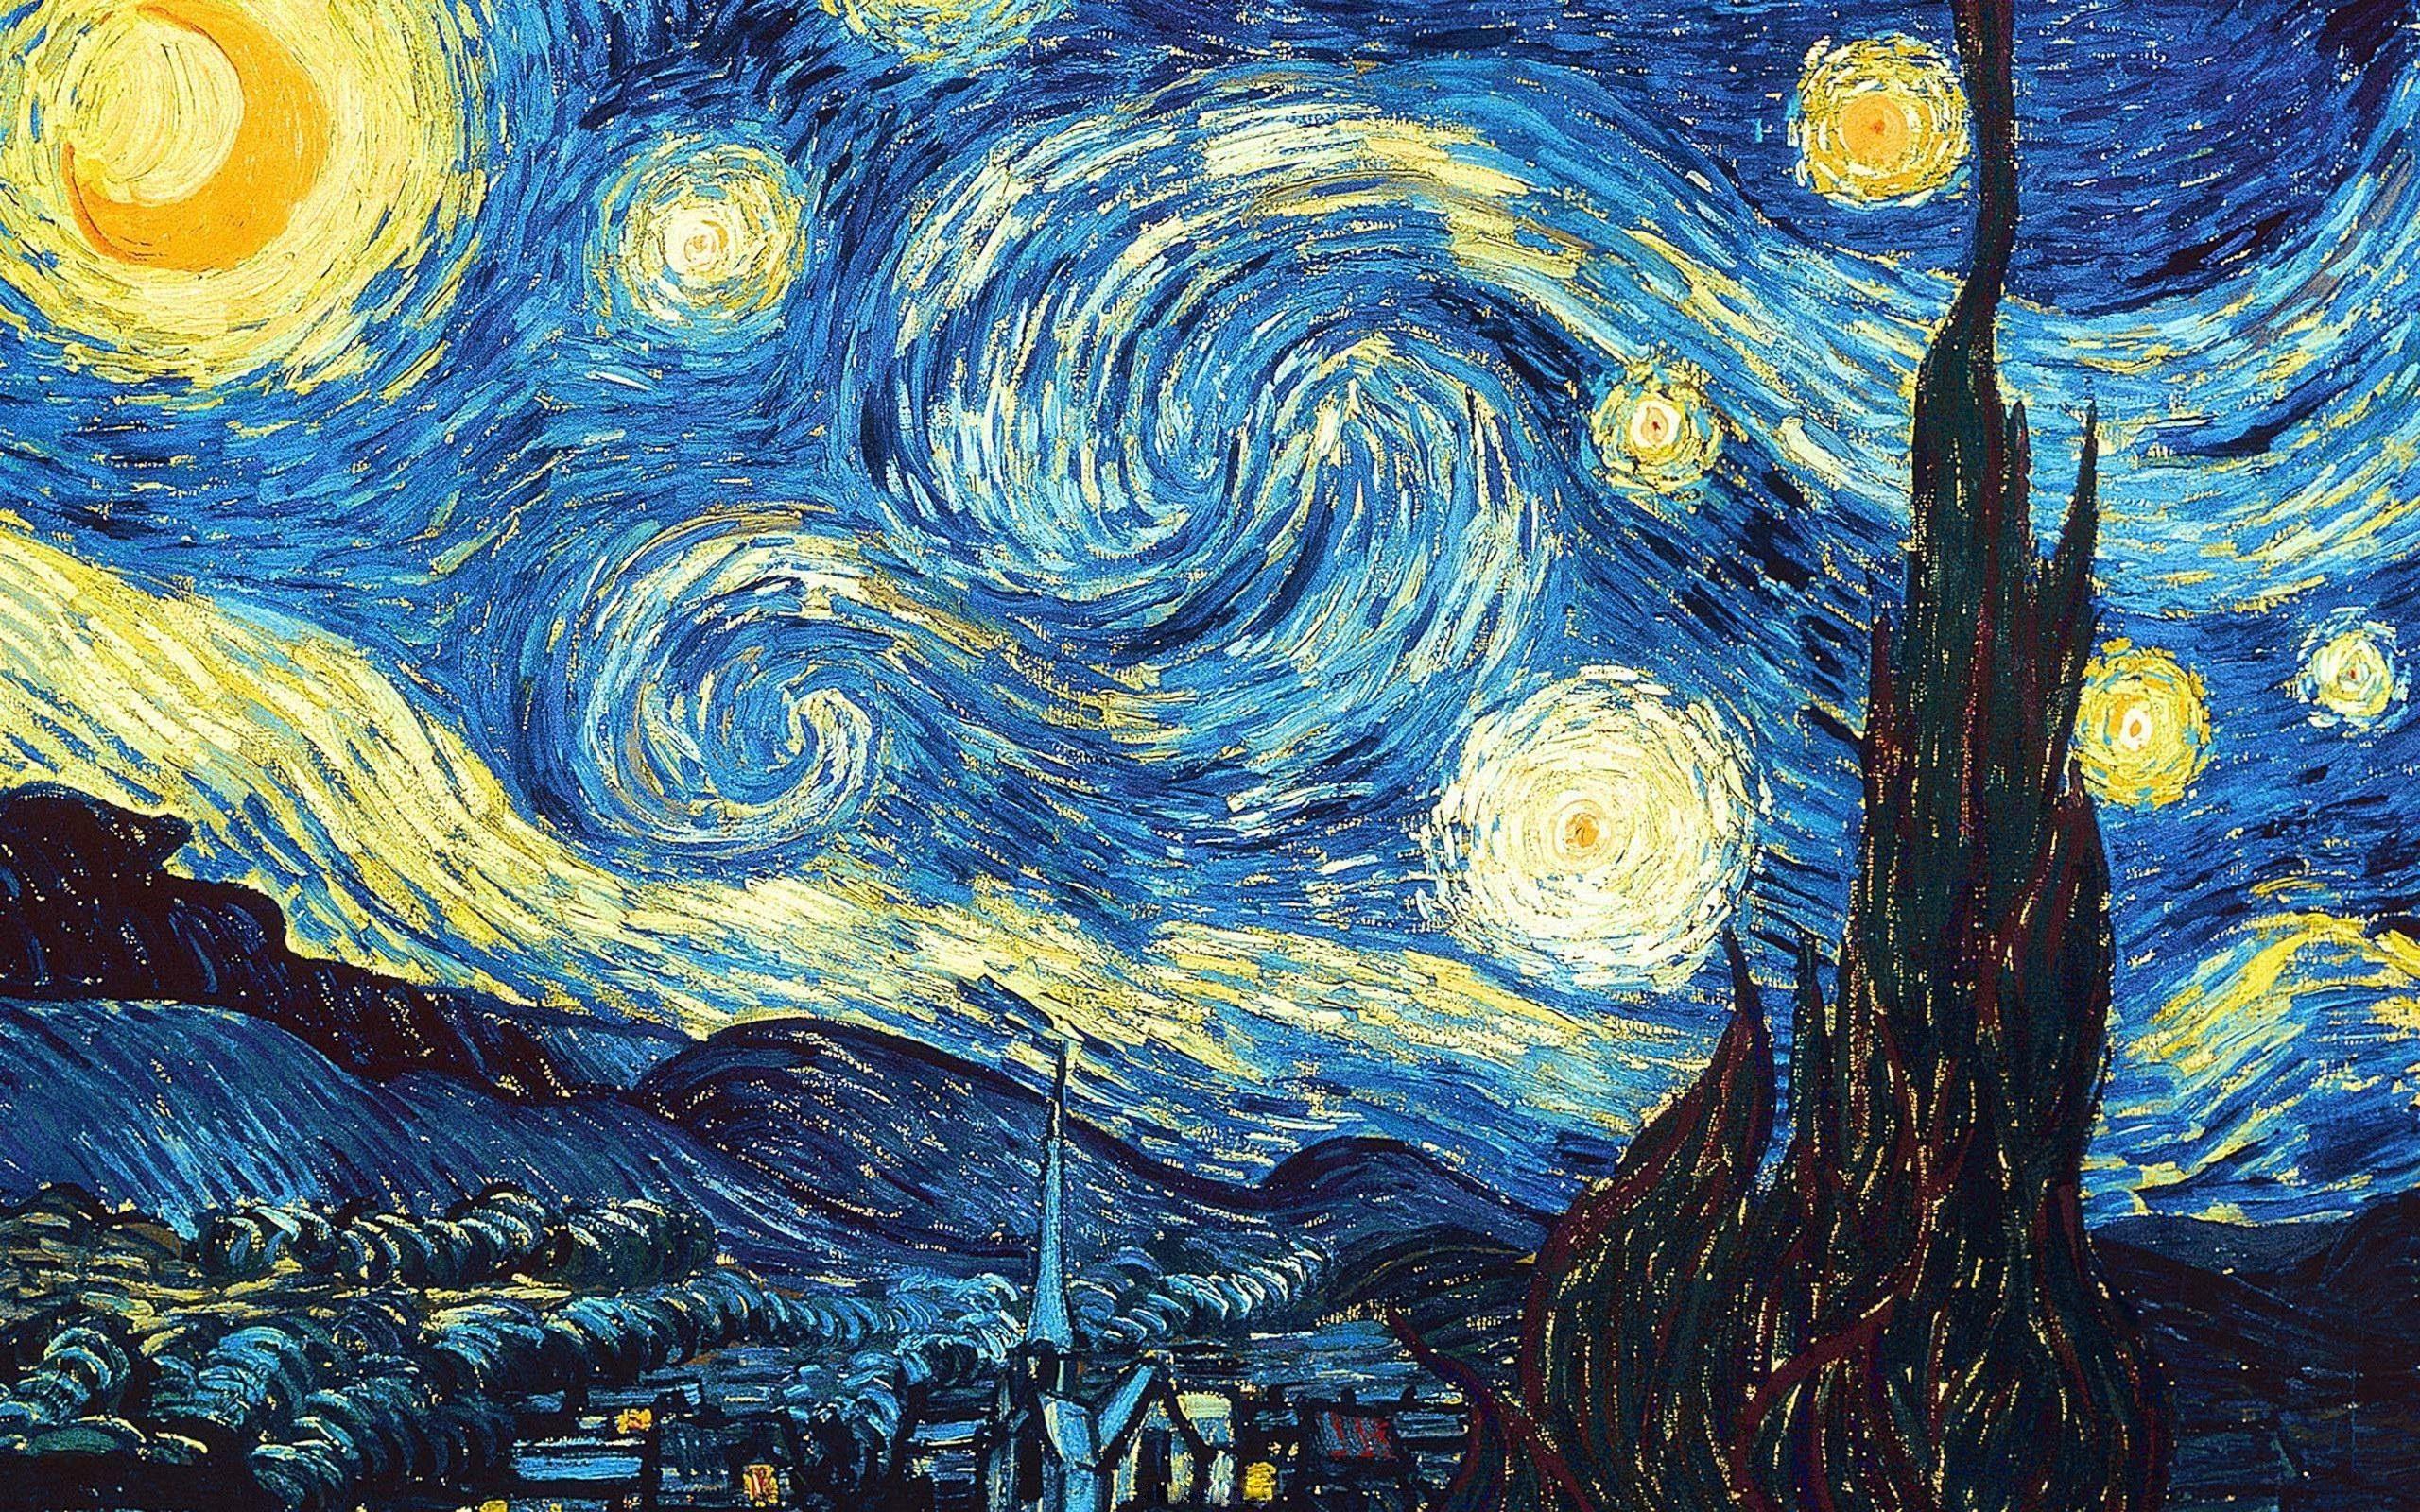 Inspirational Wallpaper 4k Van Gogh Starry Night Van Gogh Van Gogh Wallpaper Gogh The Starry Night